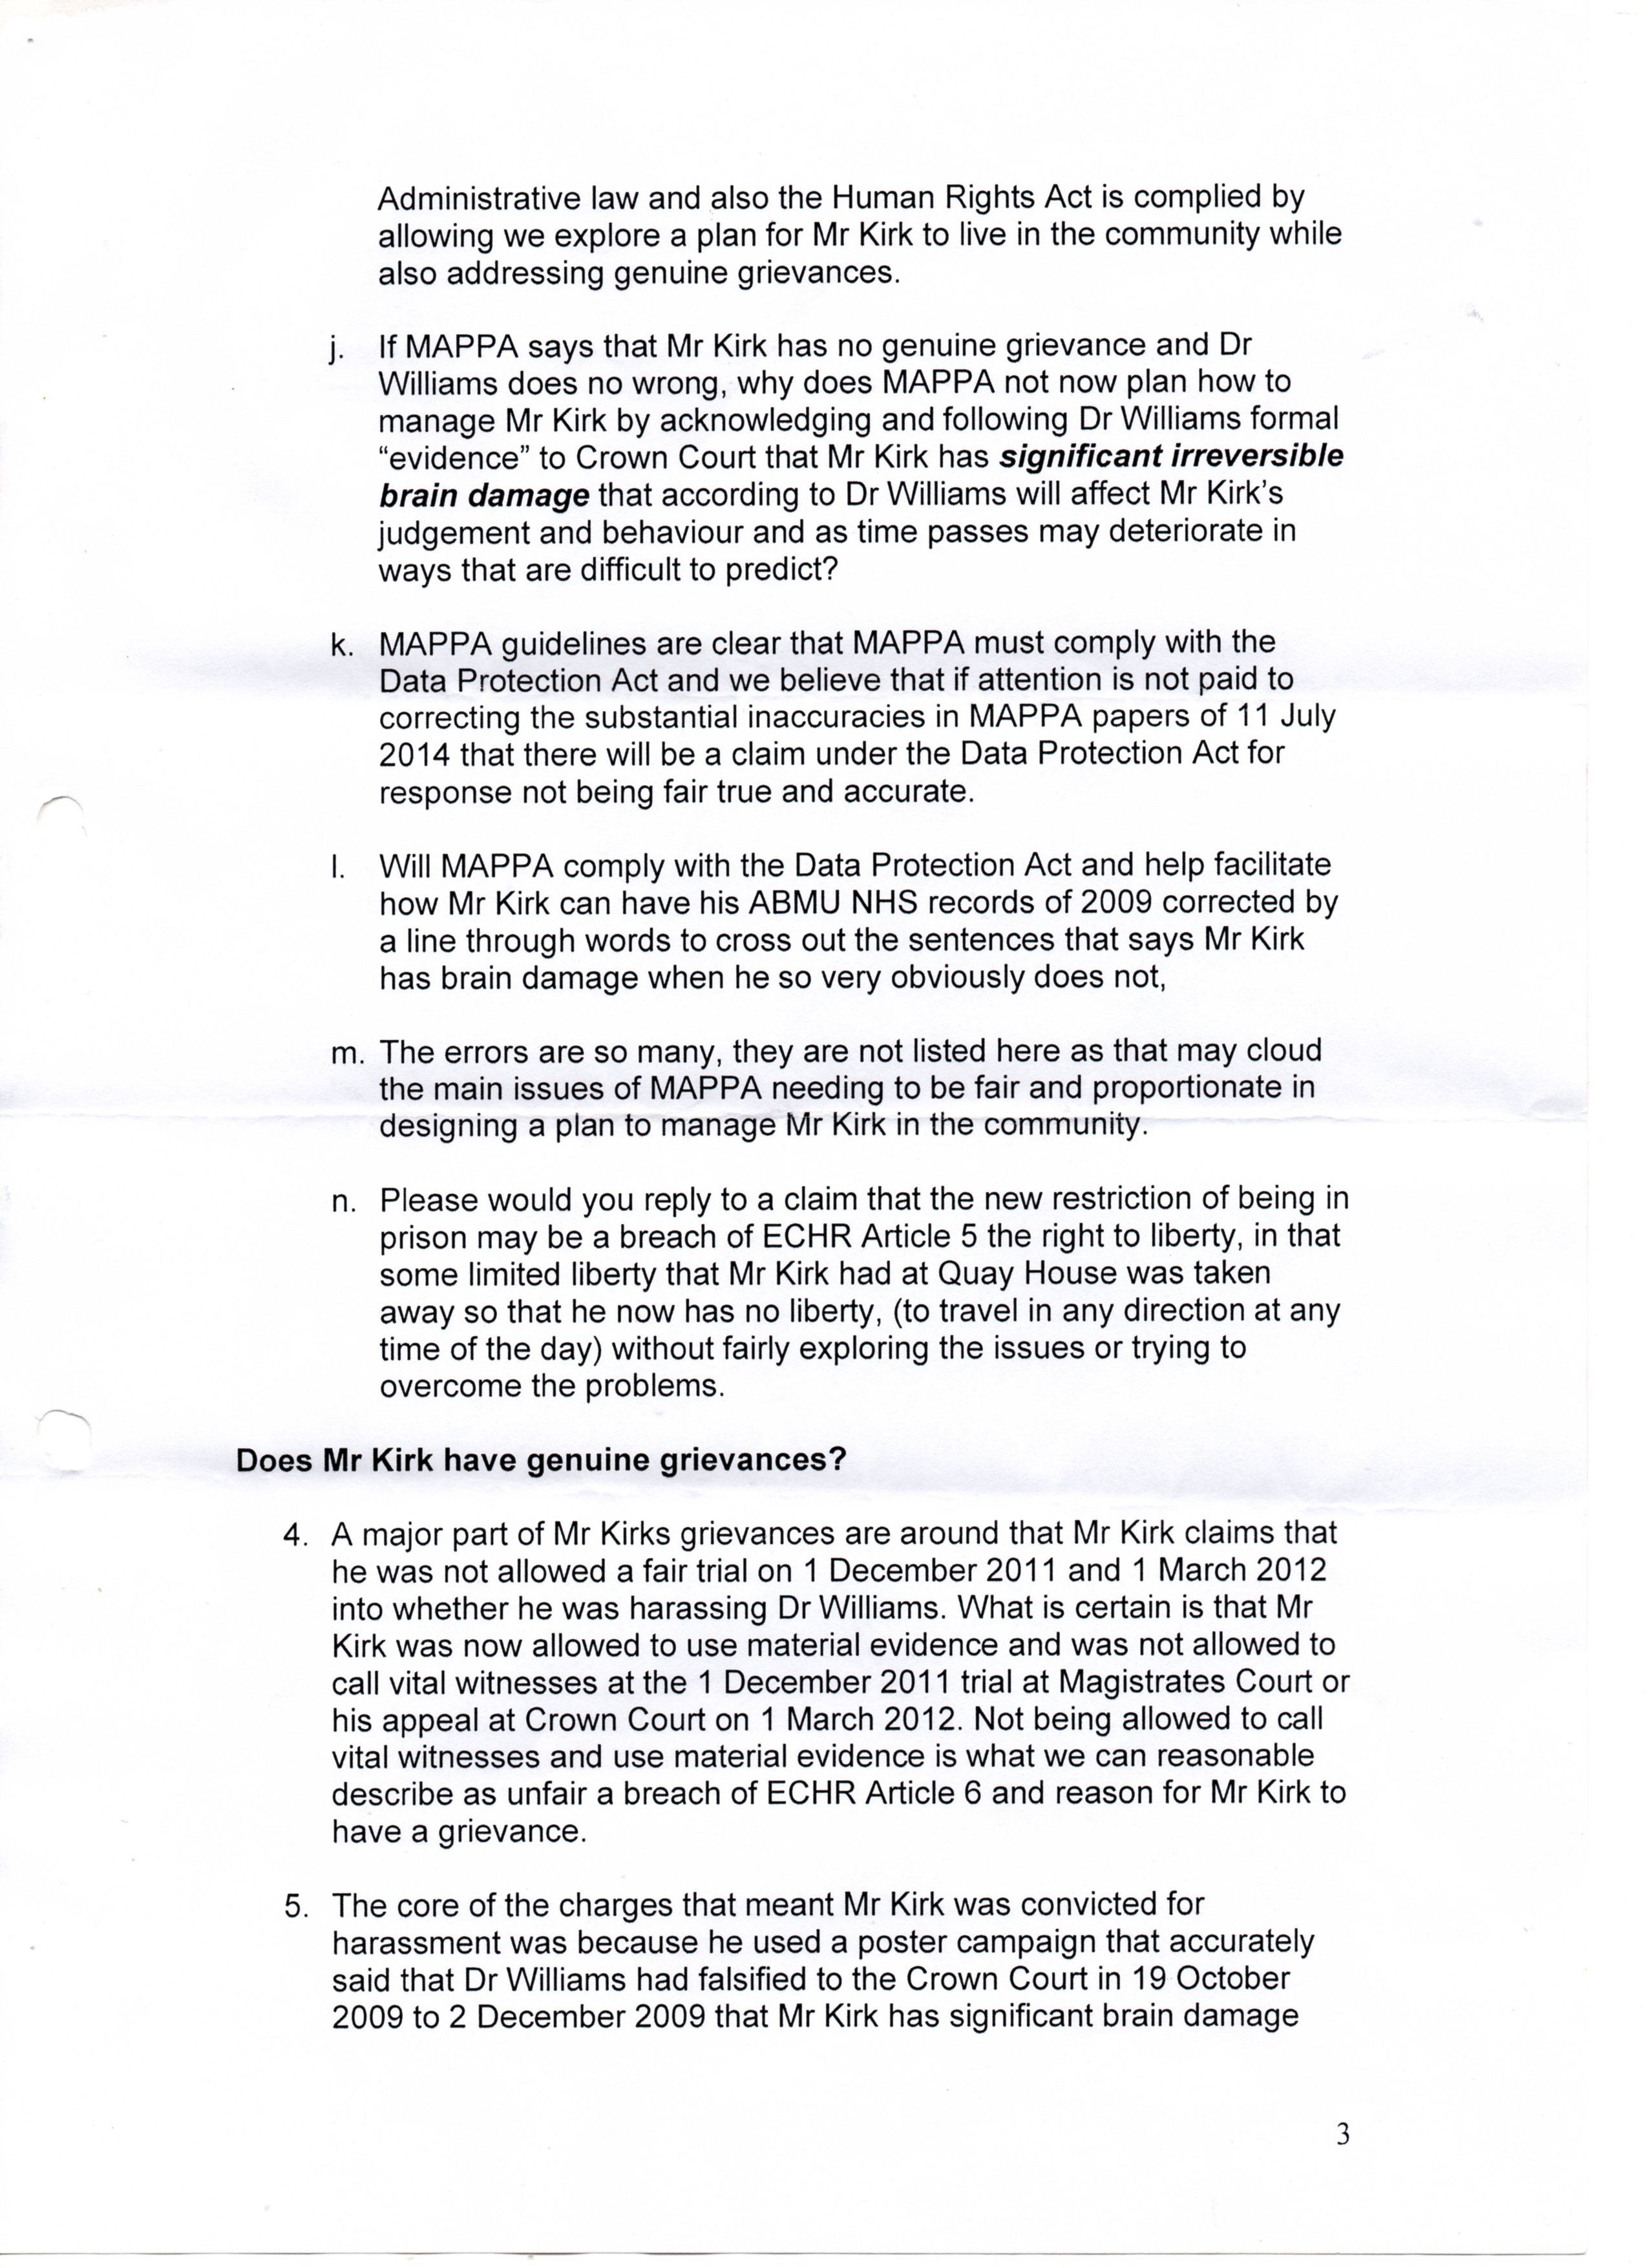 Legal Consultant Cover Letter Arguement Essay Thesis Statement